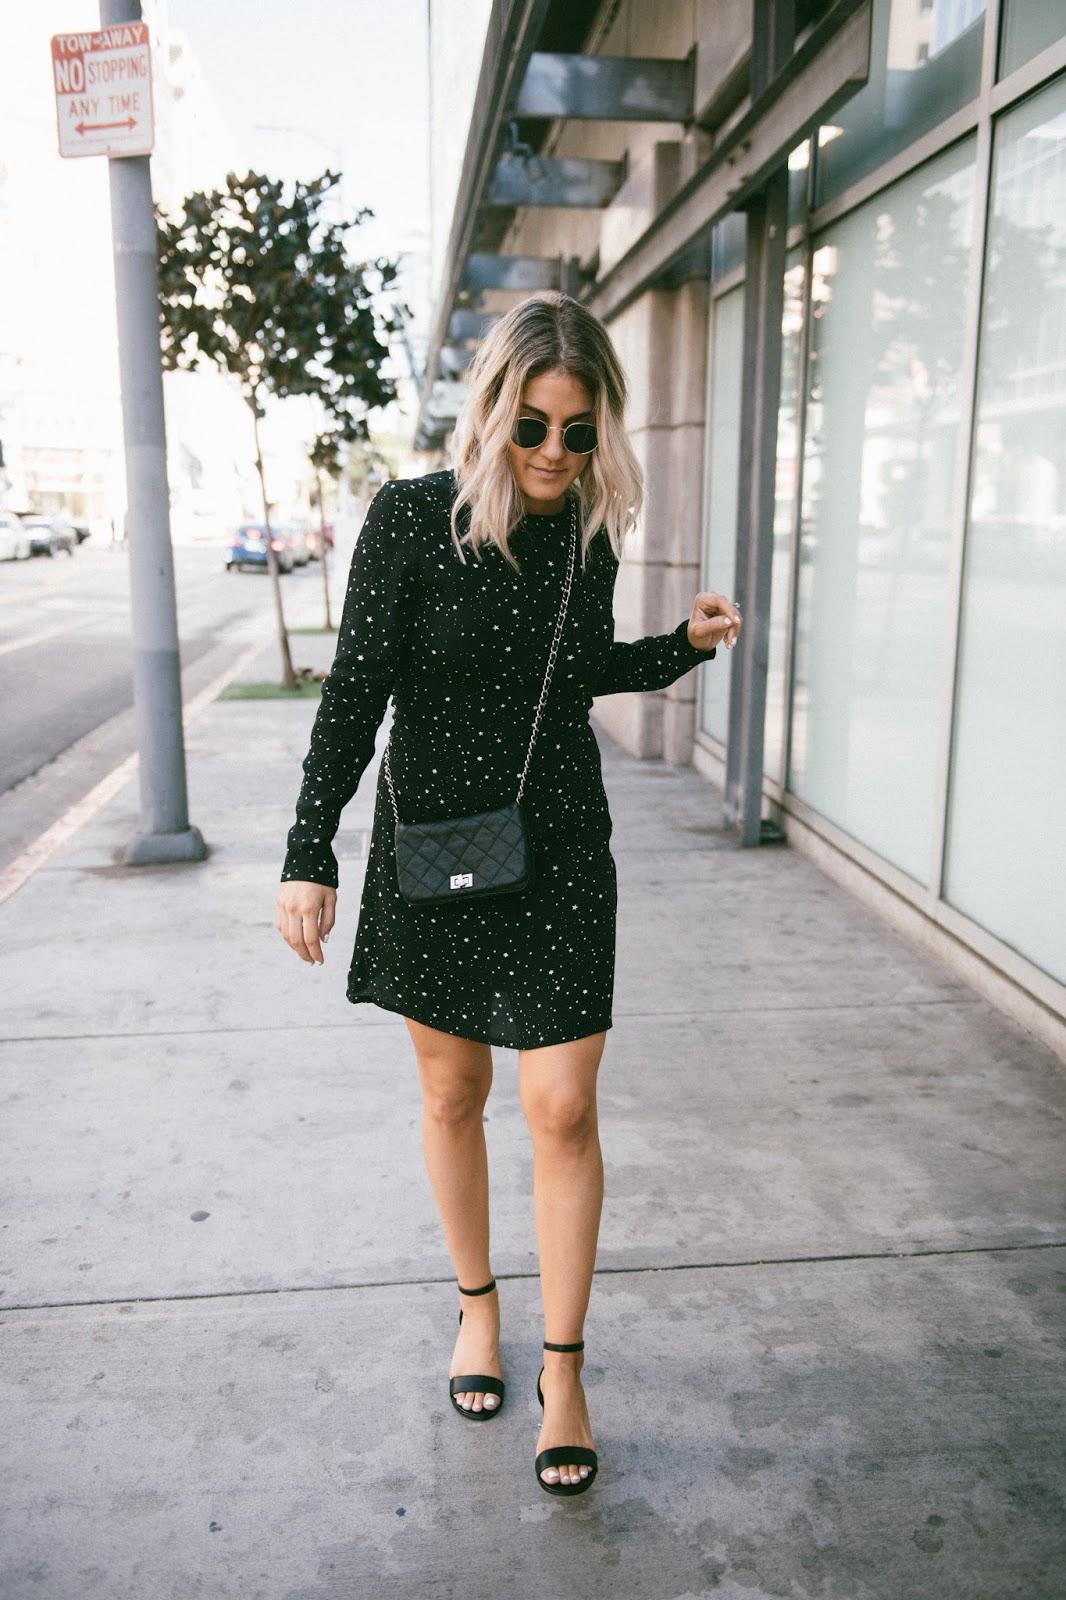 Black Star Print Dress from H&M - @taylorwinkelmeyer